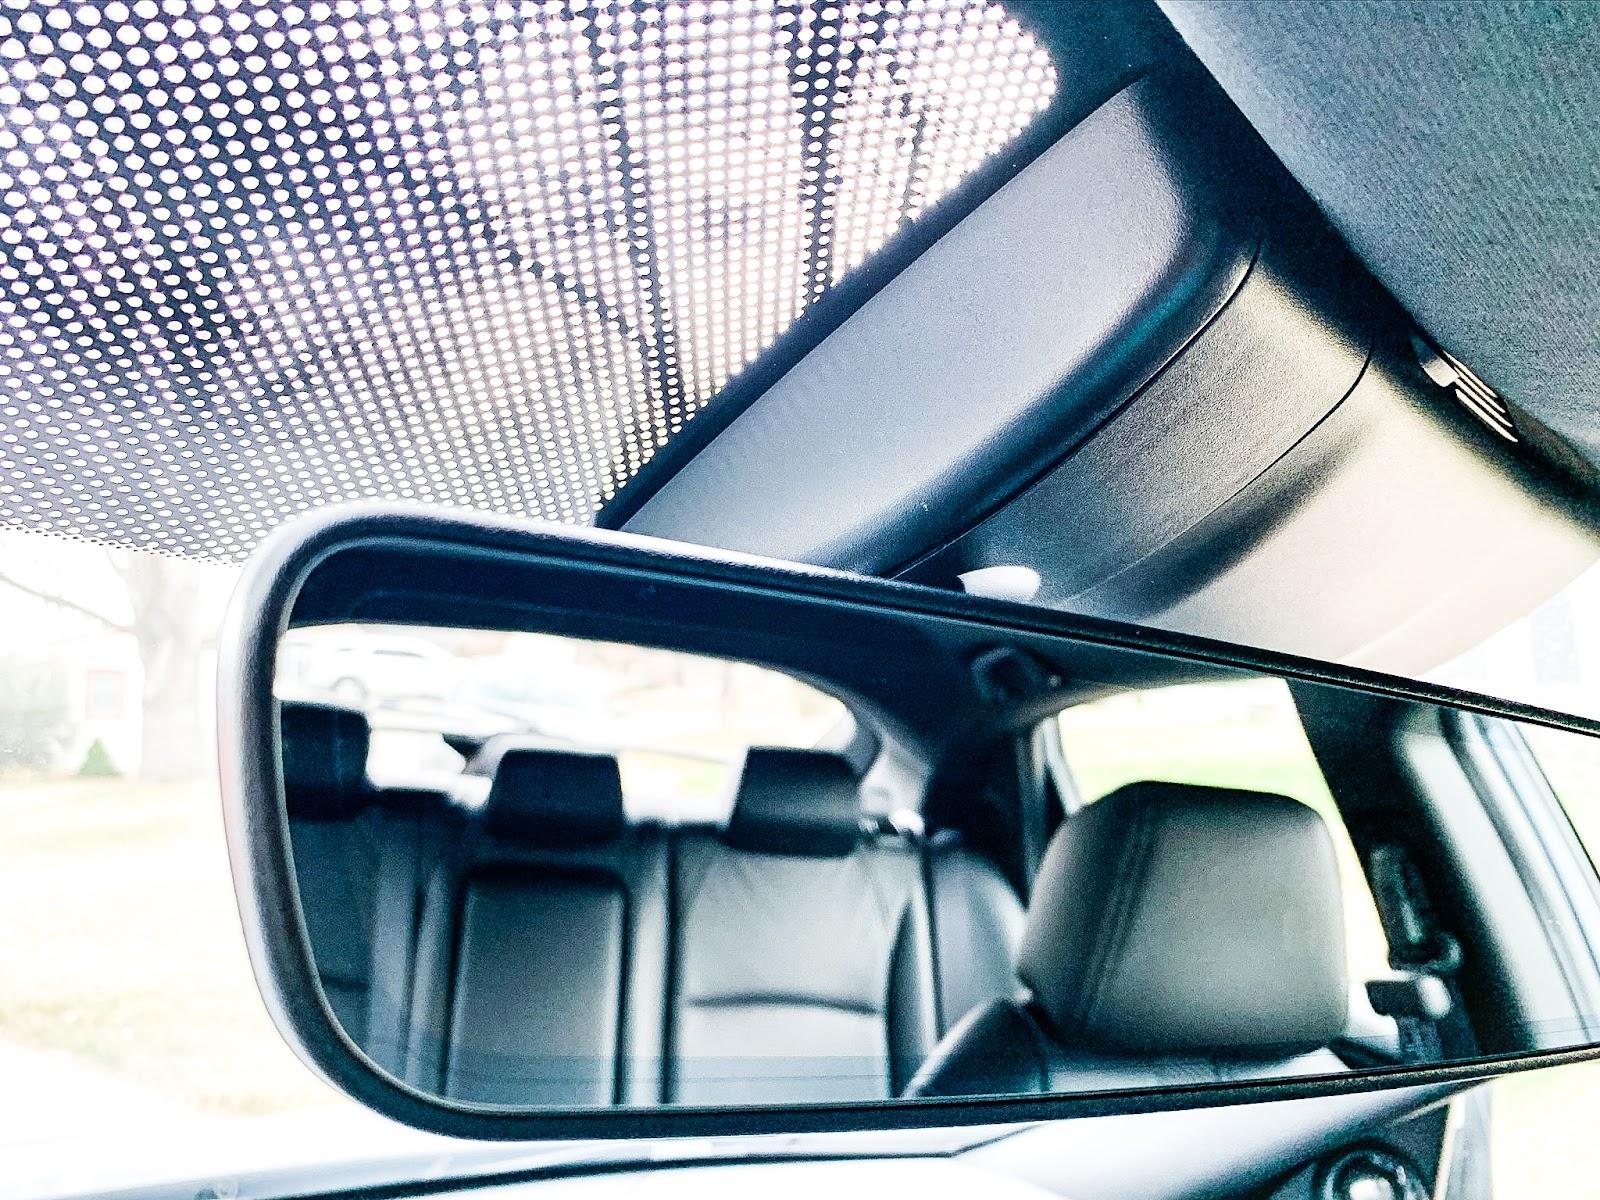 Honda Civic Hatchback Rearview Mirror